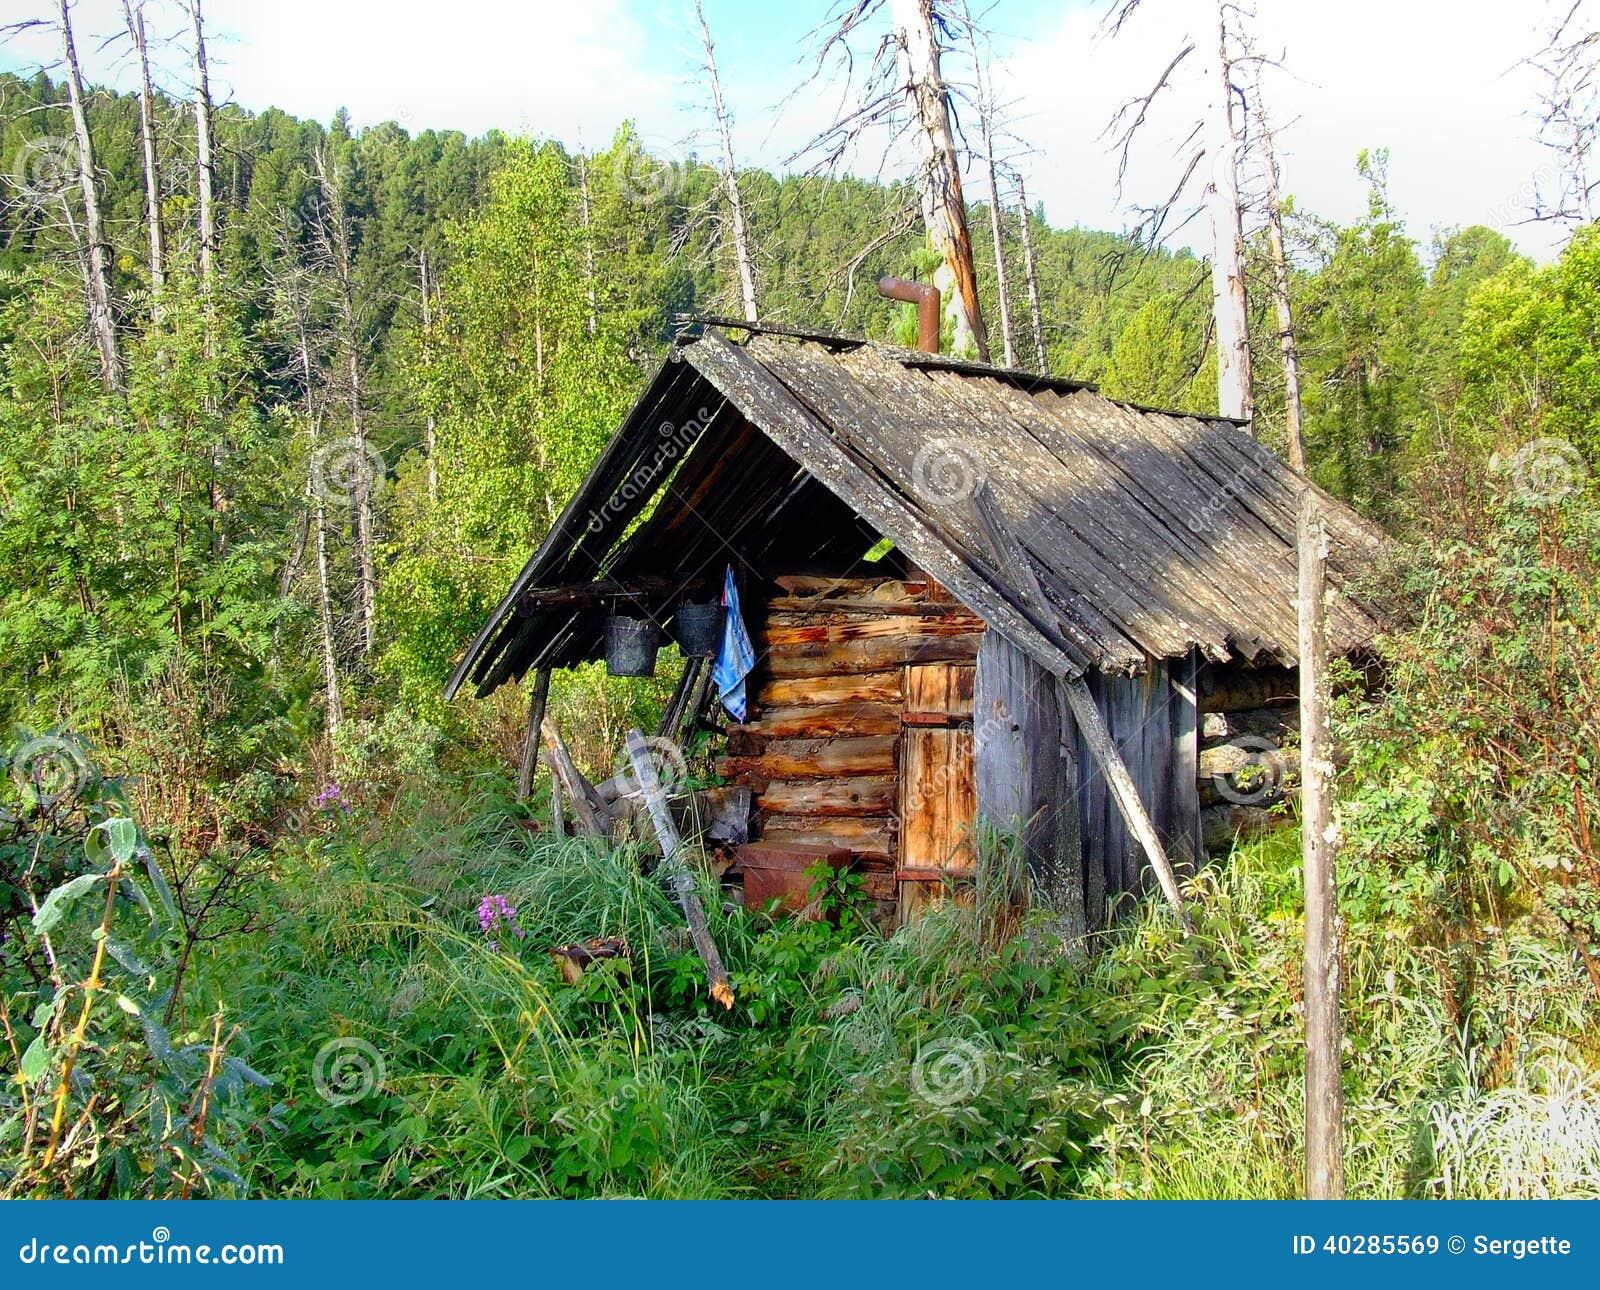 Old wooden hut hunter siberia stock image image 40285569 for Hunting hut plans